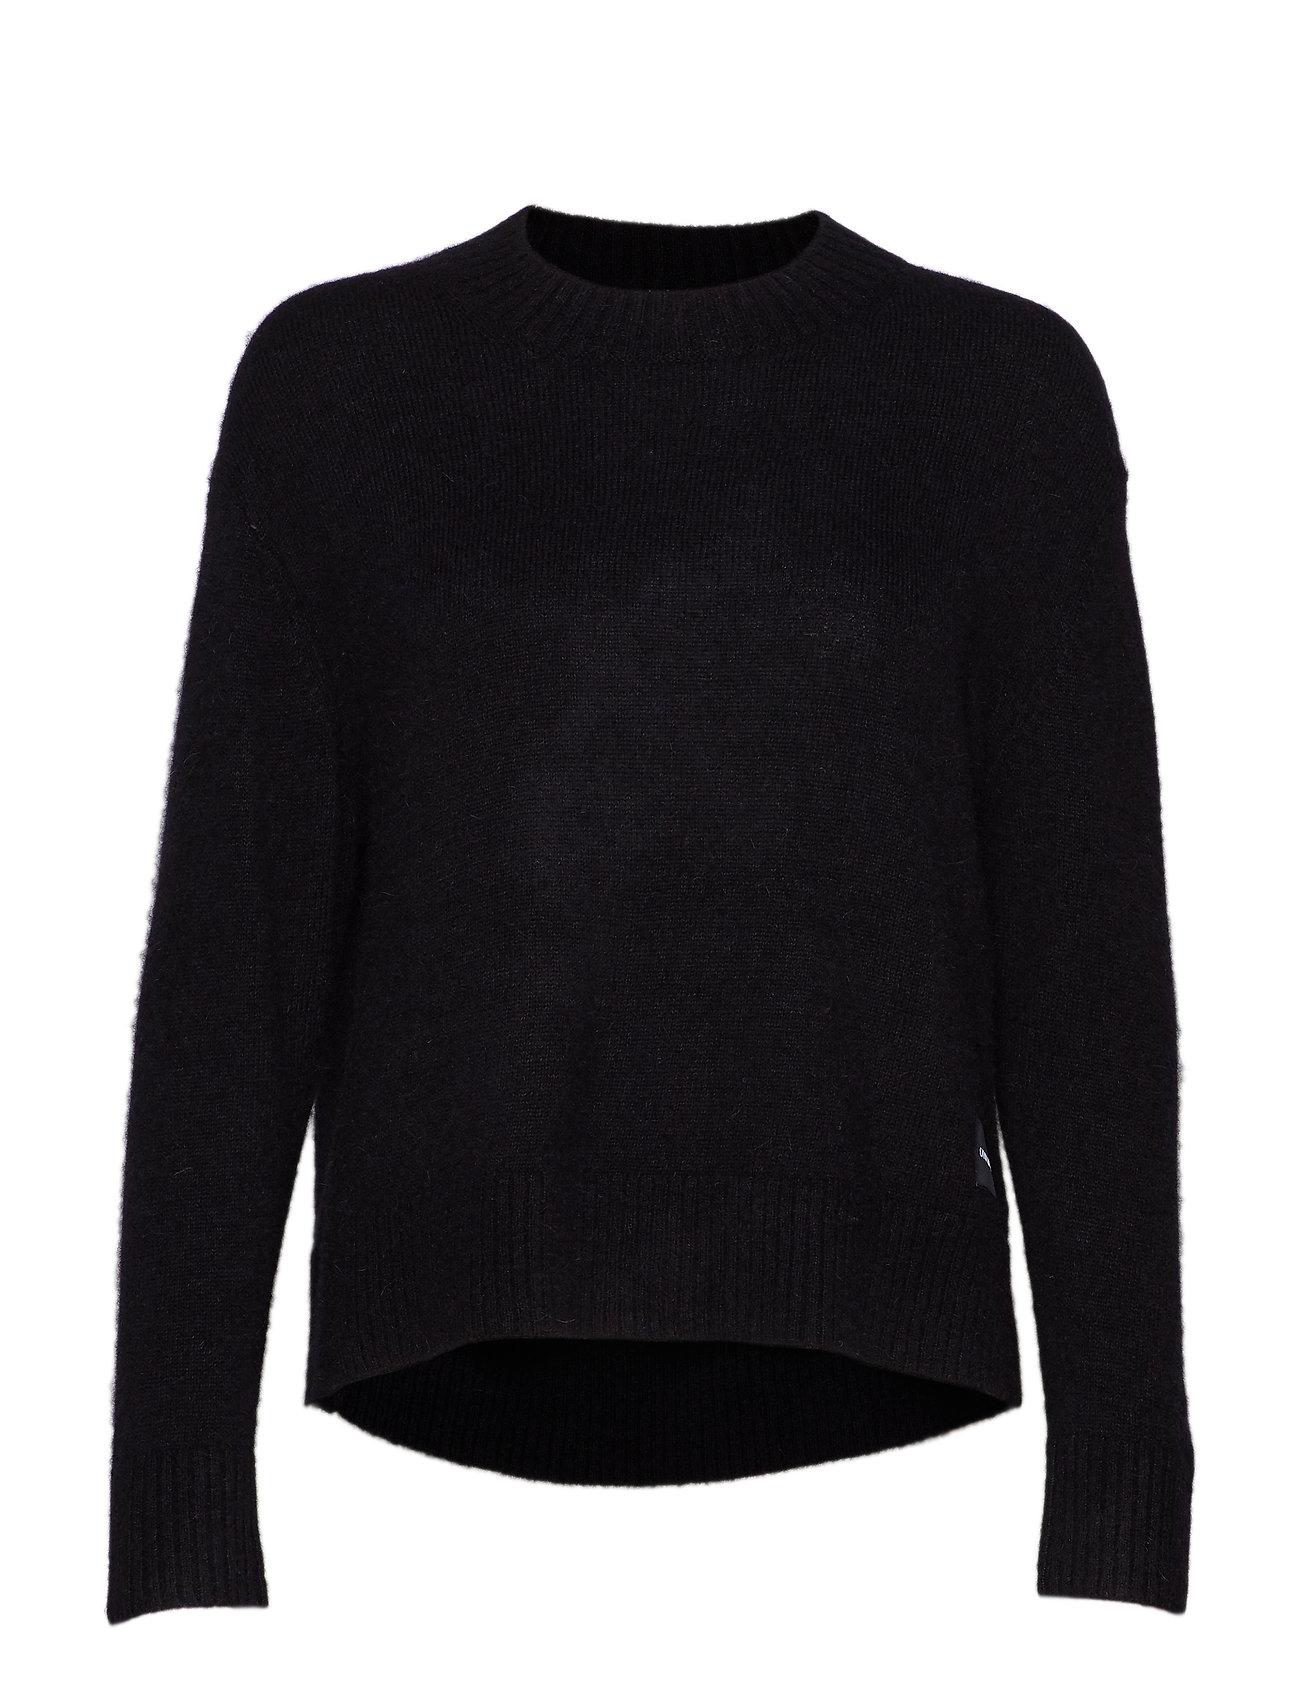 Calvin Klein Jeans ALPACA BLEND SWEATER - CK BLACK